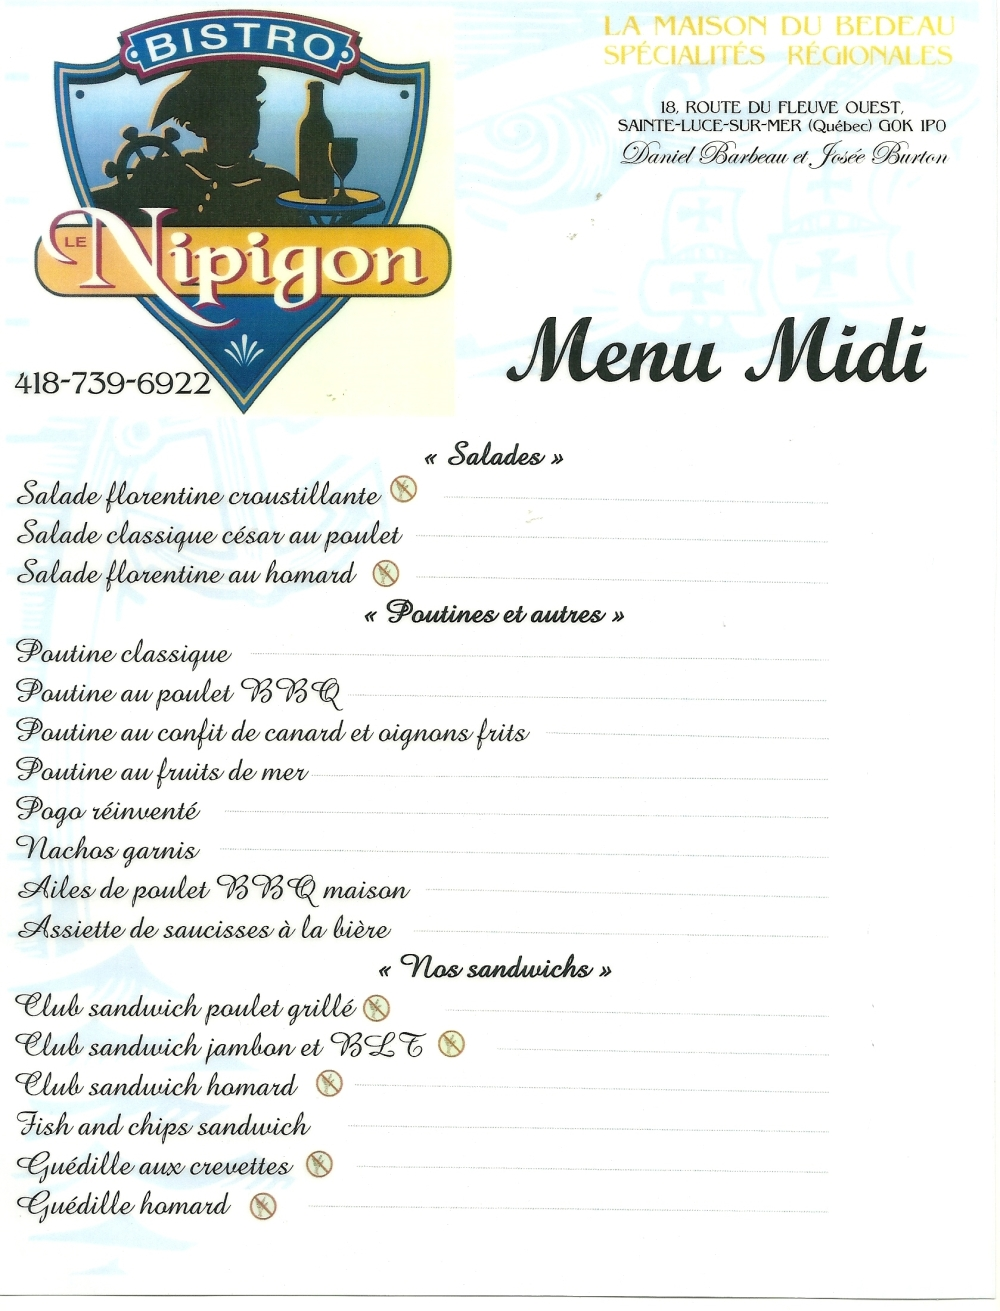 midi - salades + poutines + sandwichs